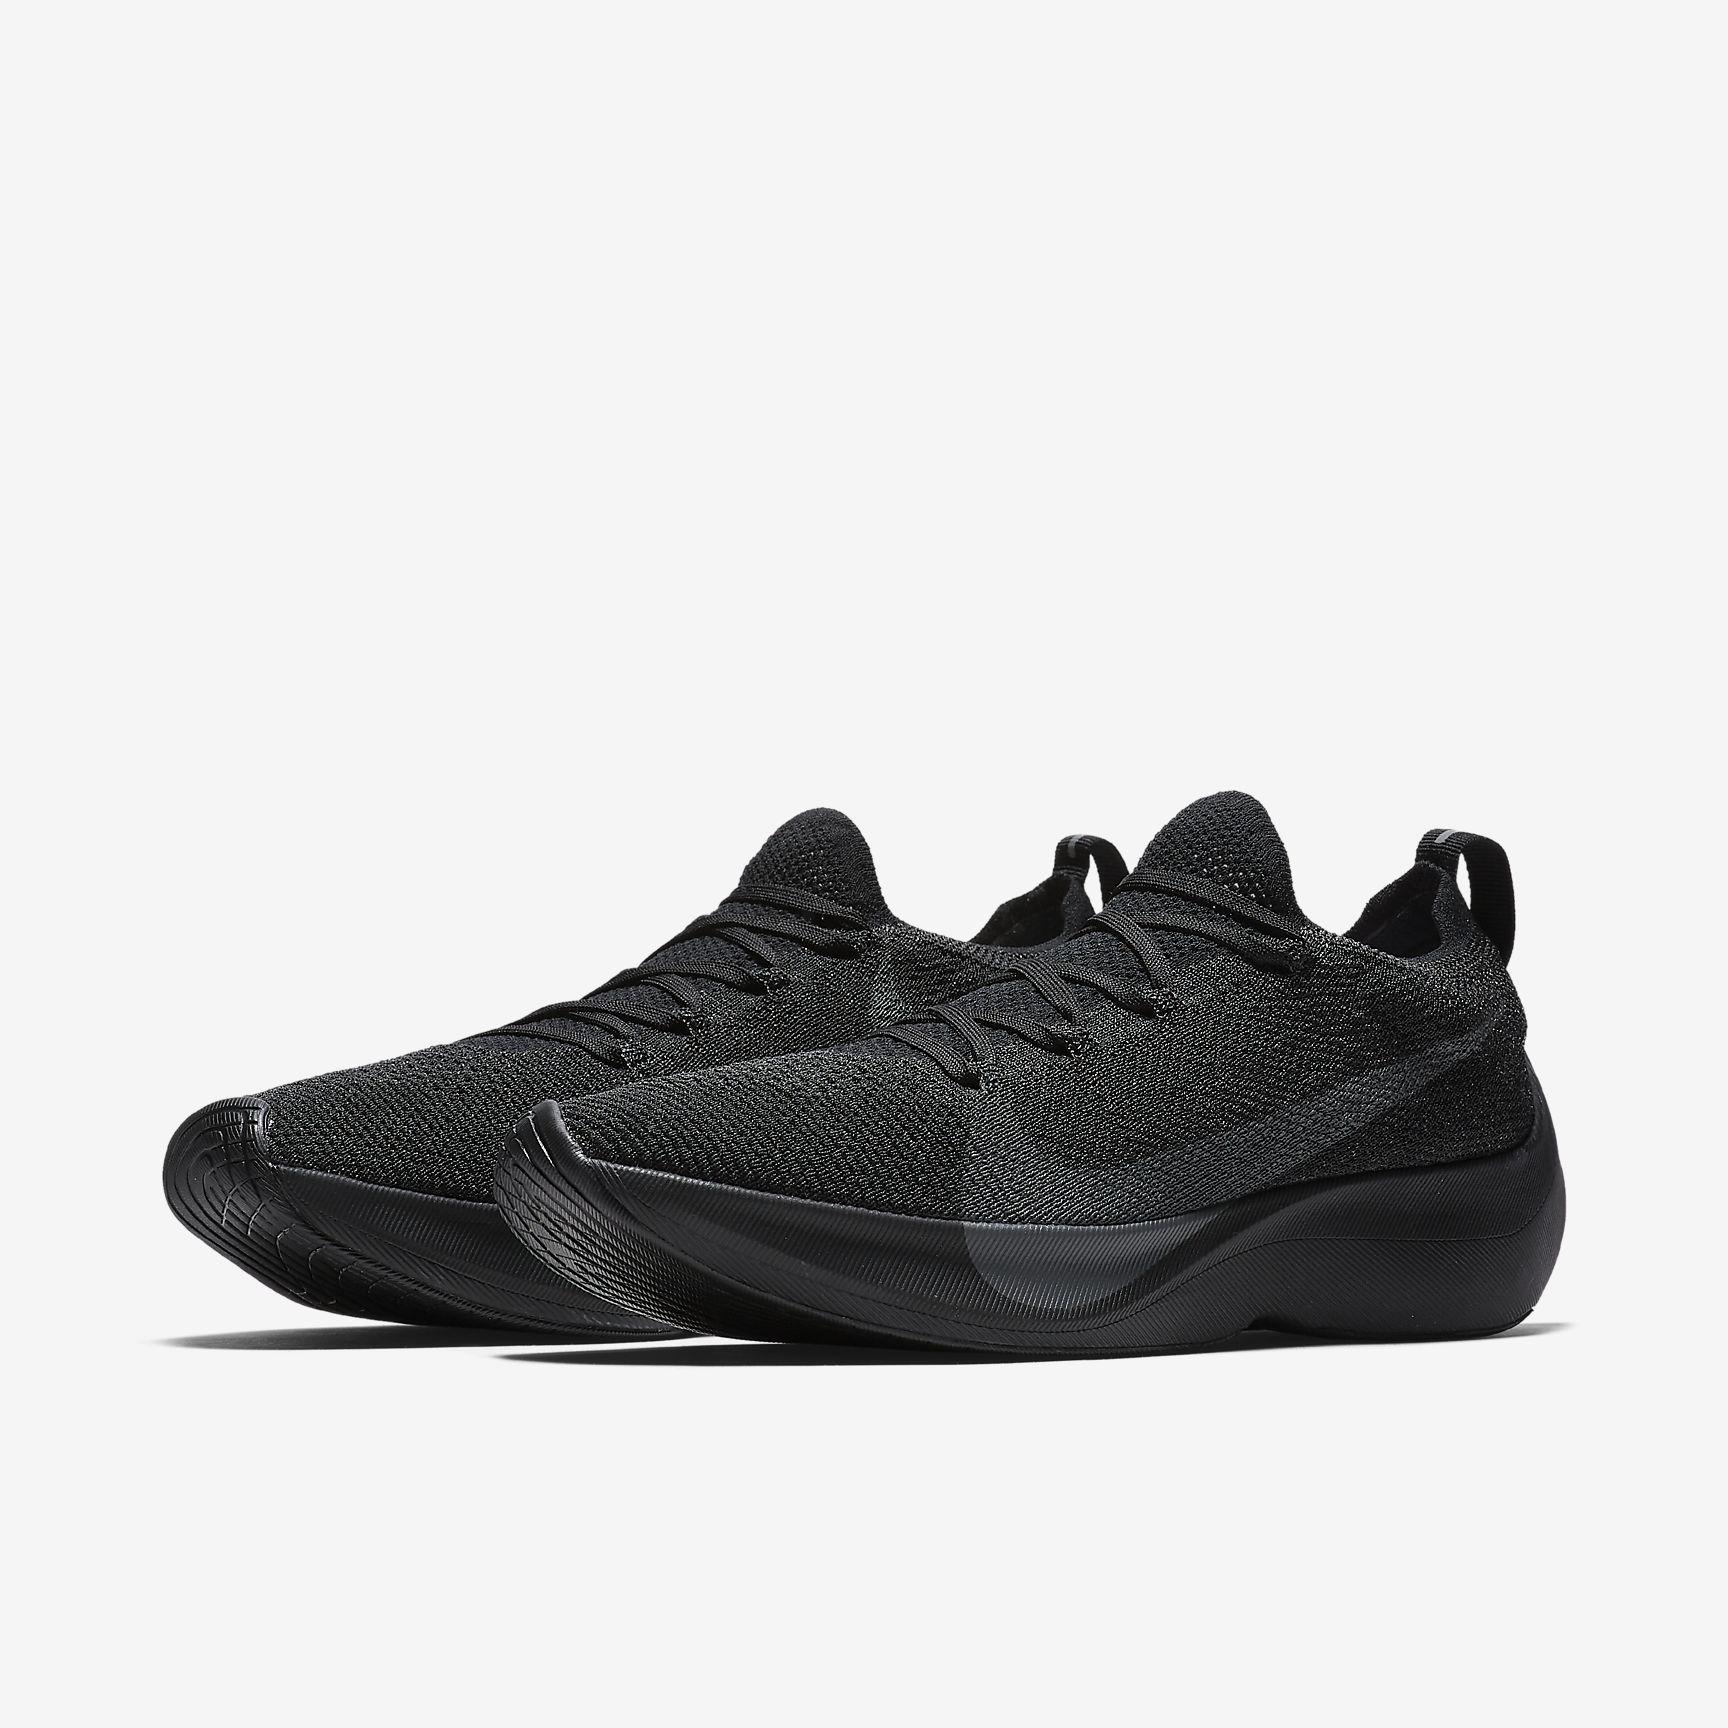 9b341da3dfcb Scarpa Nike React Vapor Street Flyknit - Uomo